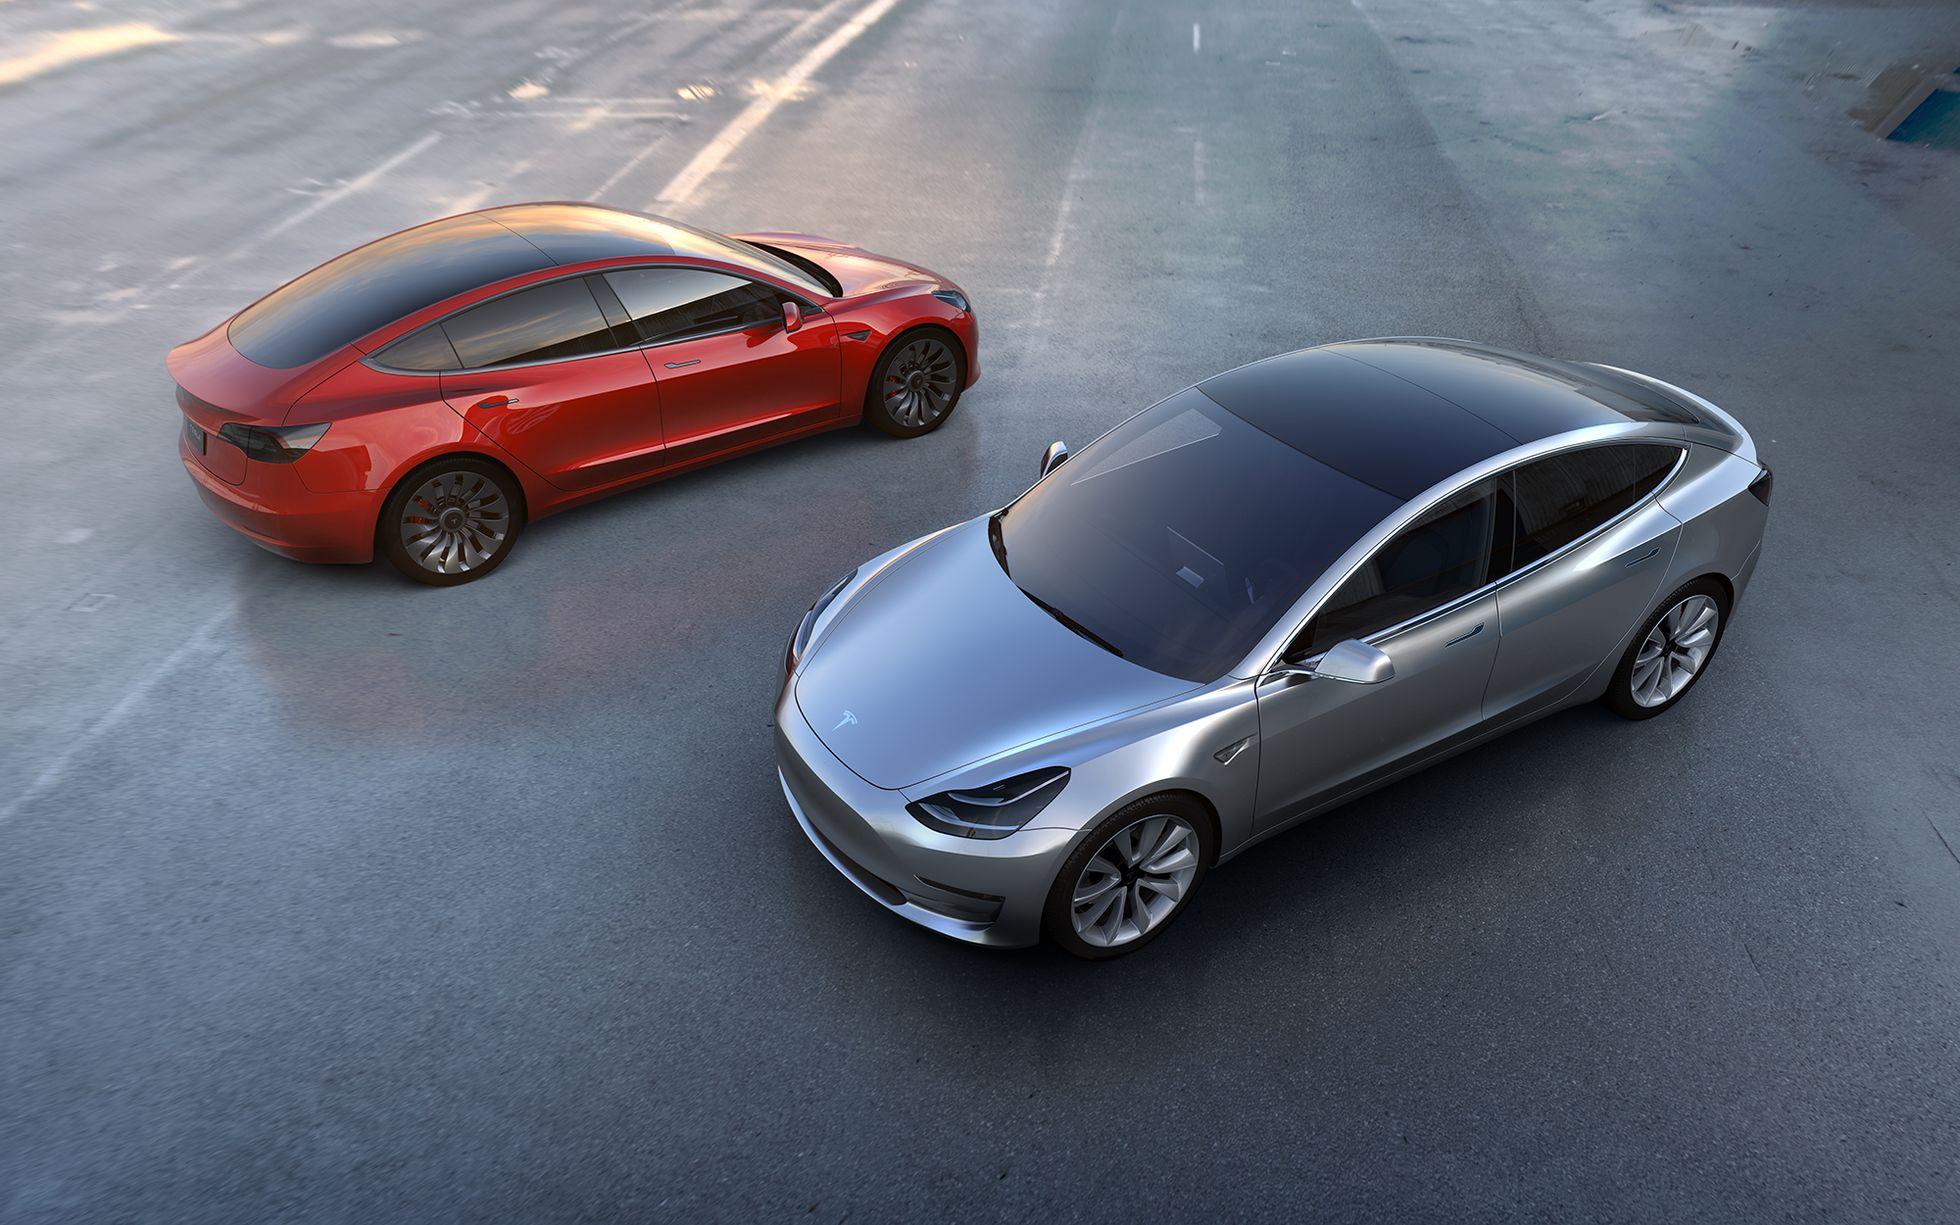 Elektroauto: Tesla Model 3 startet mit 115.000 Reservierungen - Tesla Model 3 (Bild: Tesla Motors)